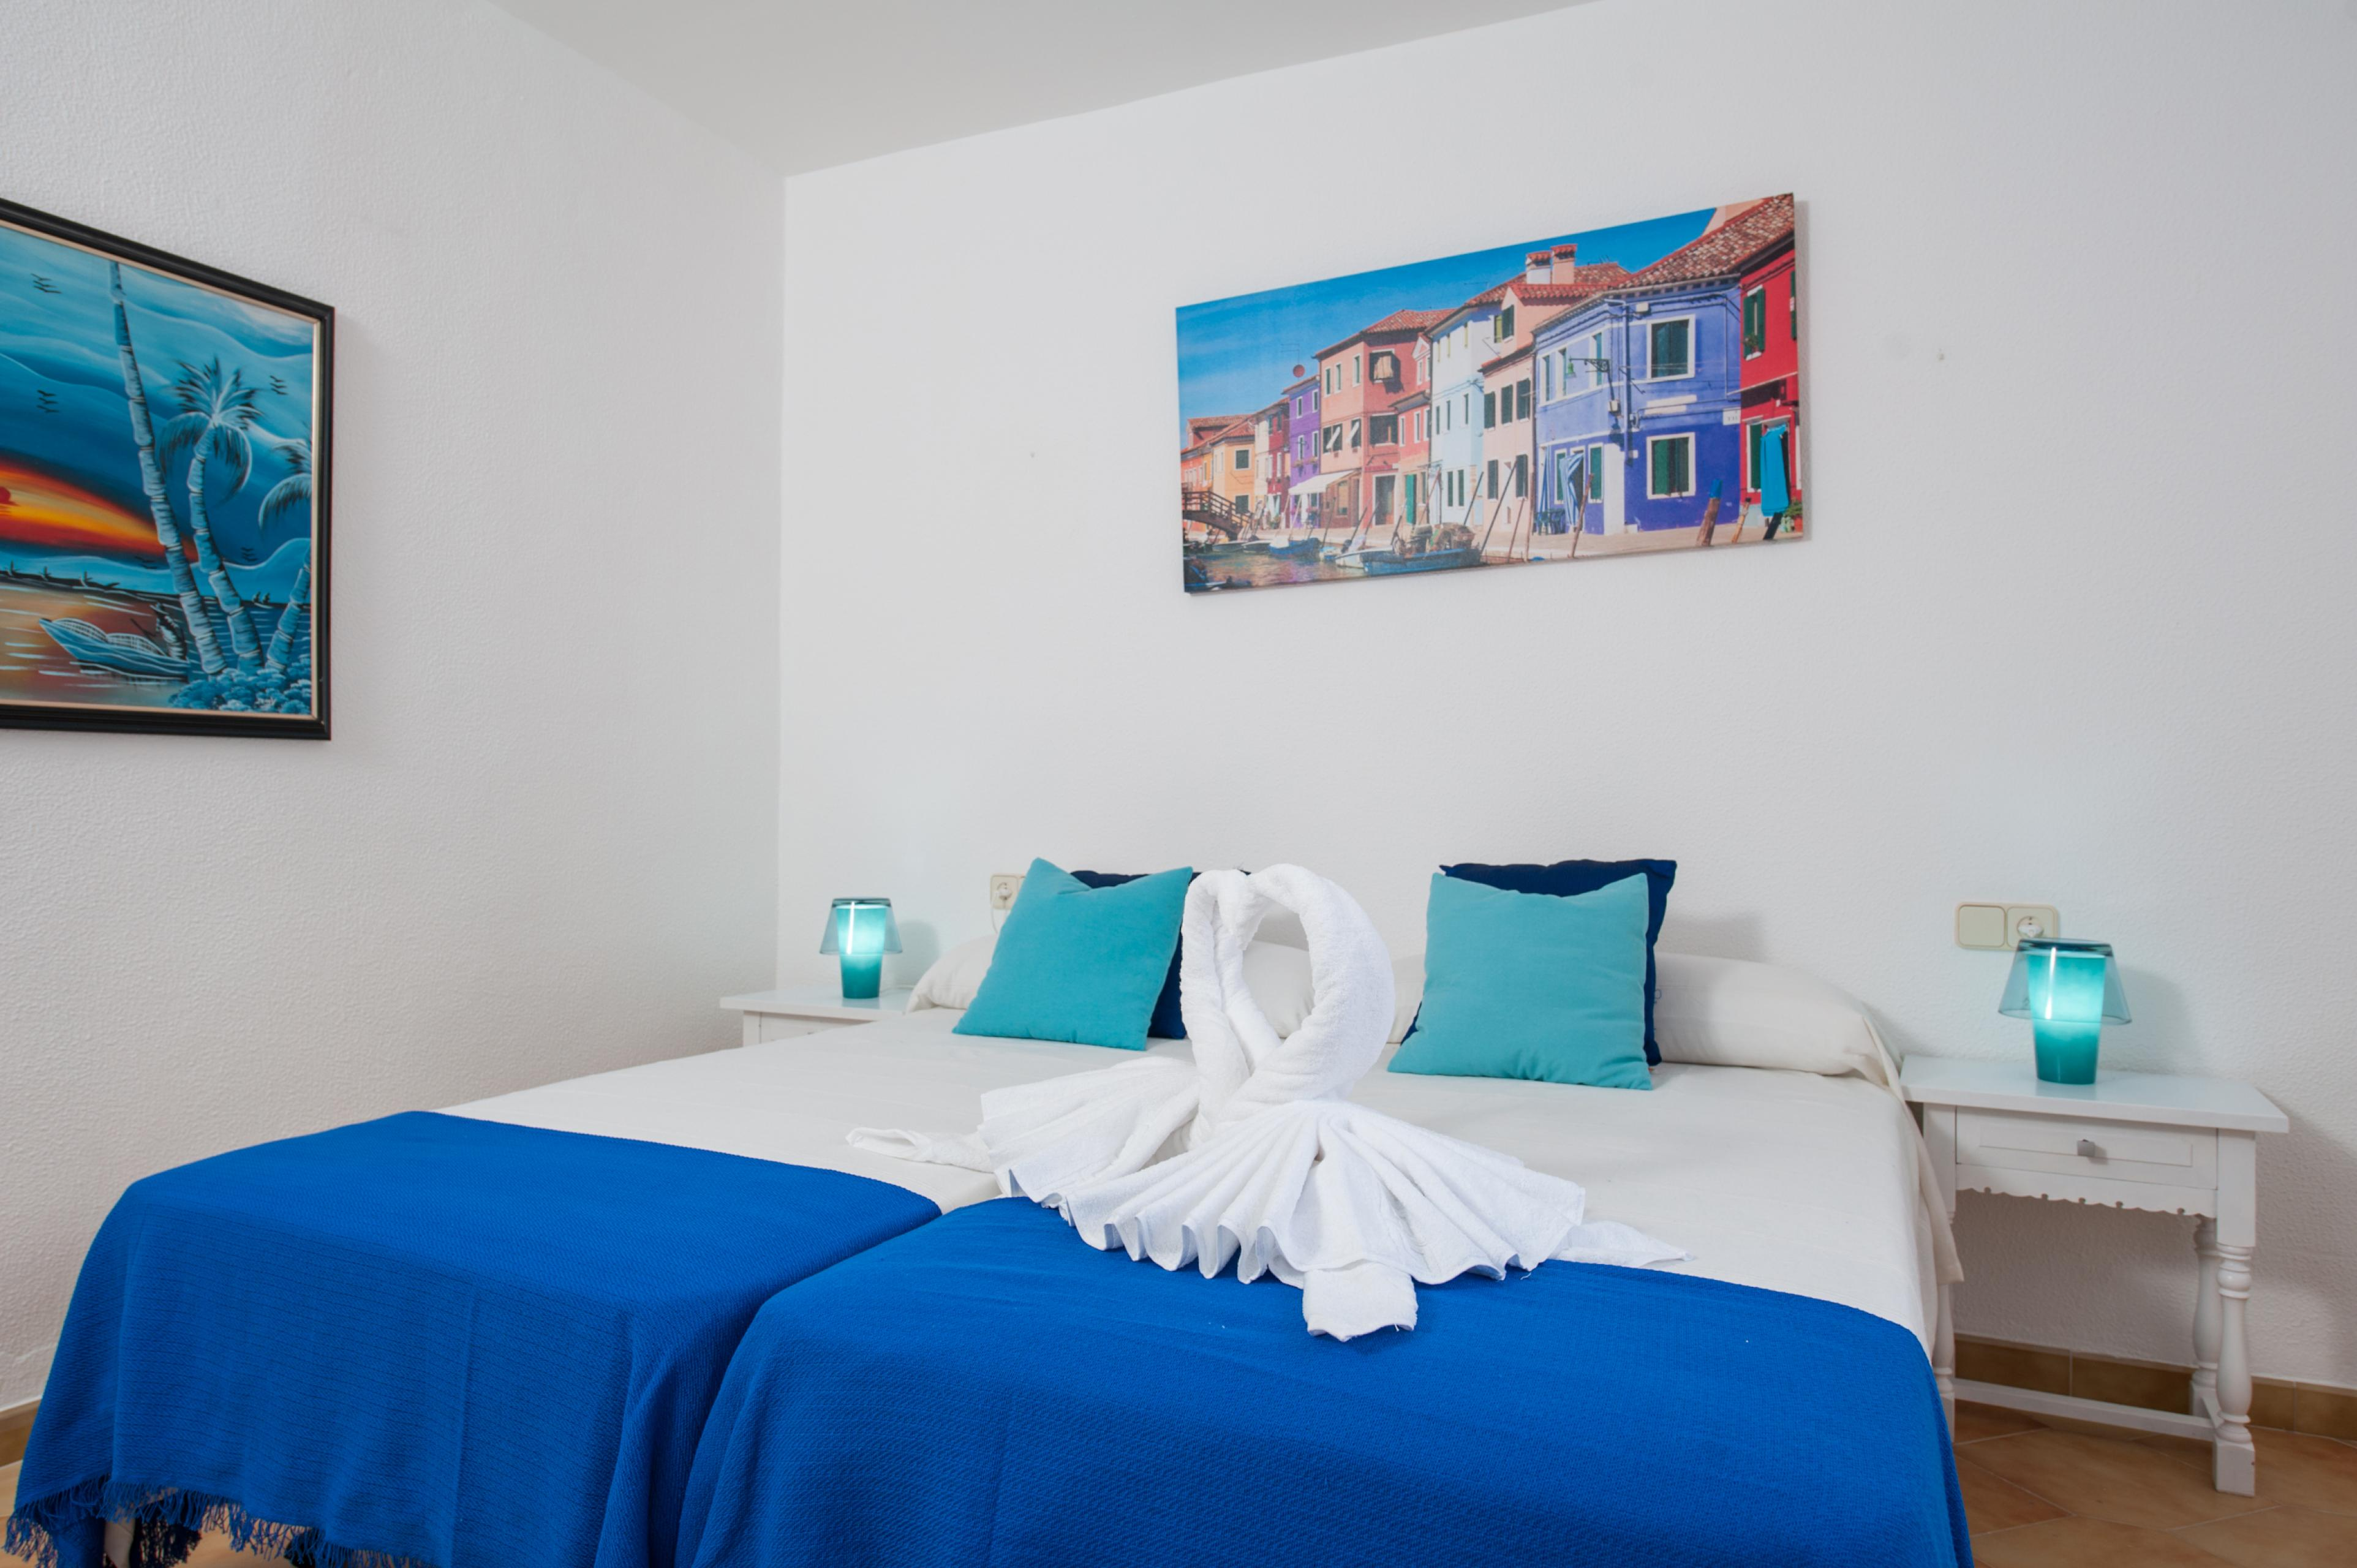 Maison de vacances CA'N LLUC- Alaró- MALLORCA - Kostenloses WLAN (2687507), Alaro, Majorque, Iles Baléares, Espagne, image 23